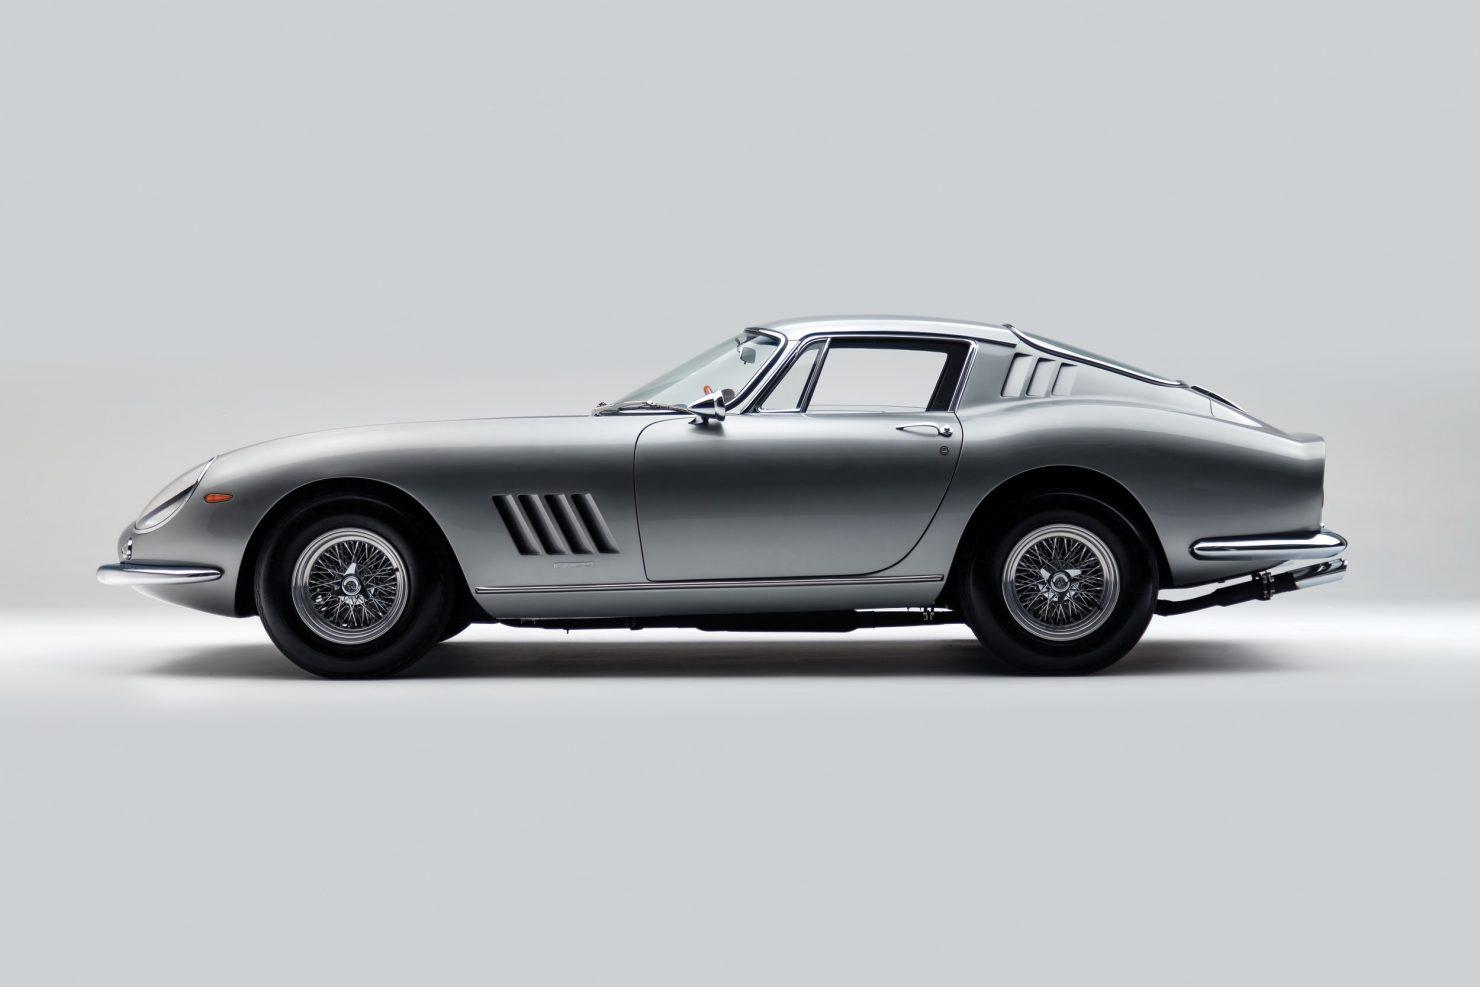 ferrari 275 gtb car 20 1480x987 - 1965 Ferrari 275 GTB/6C Alloy